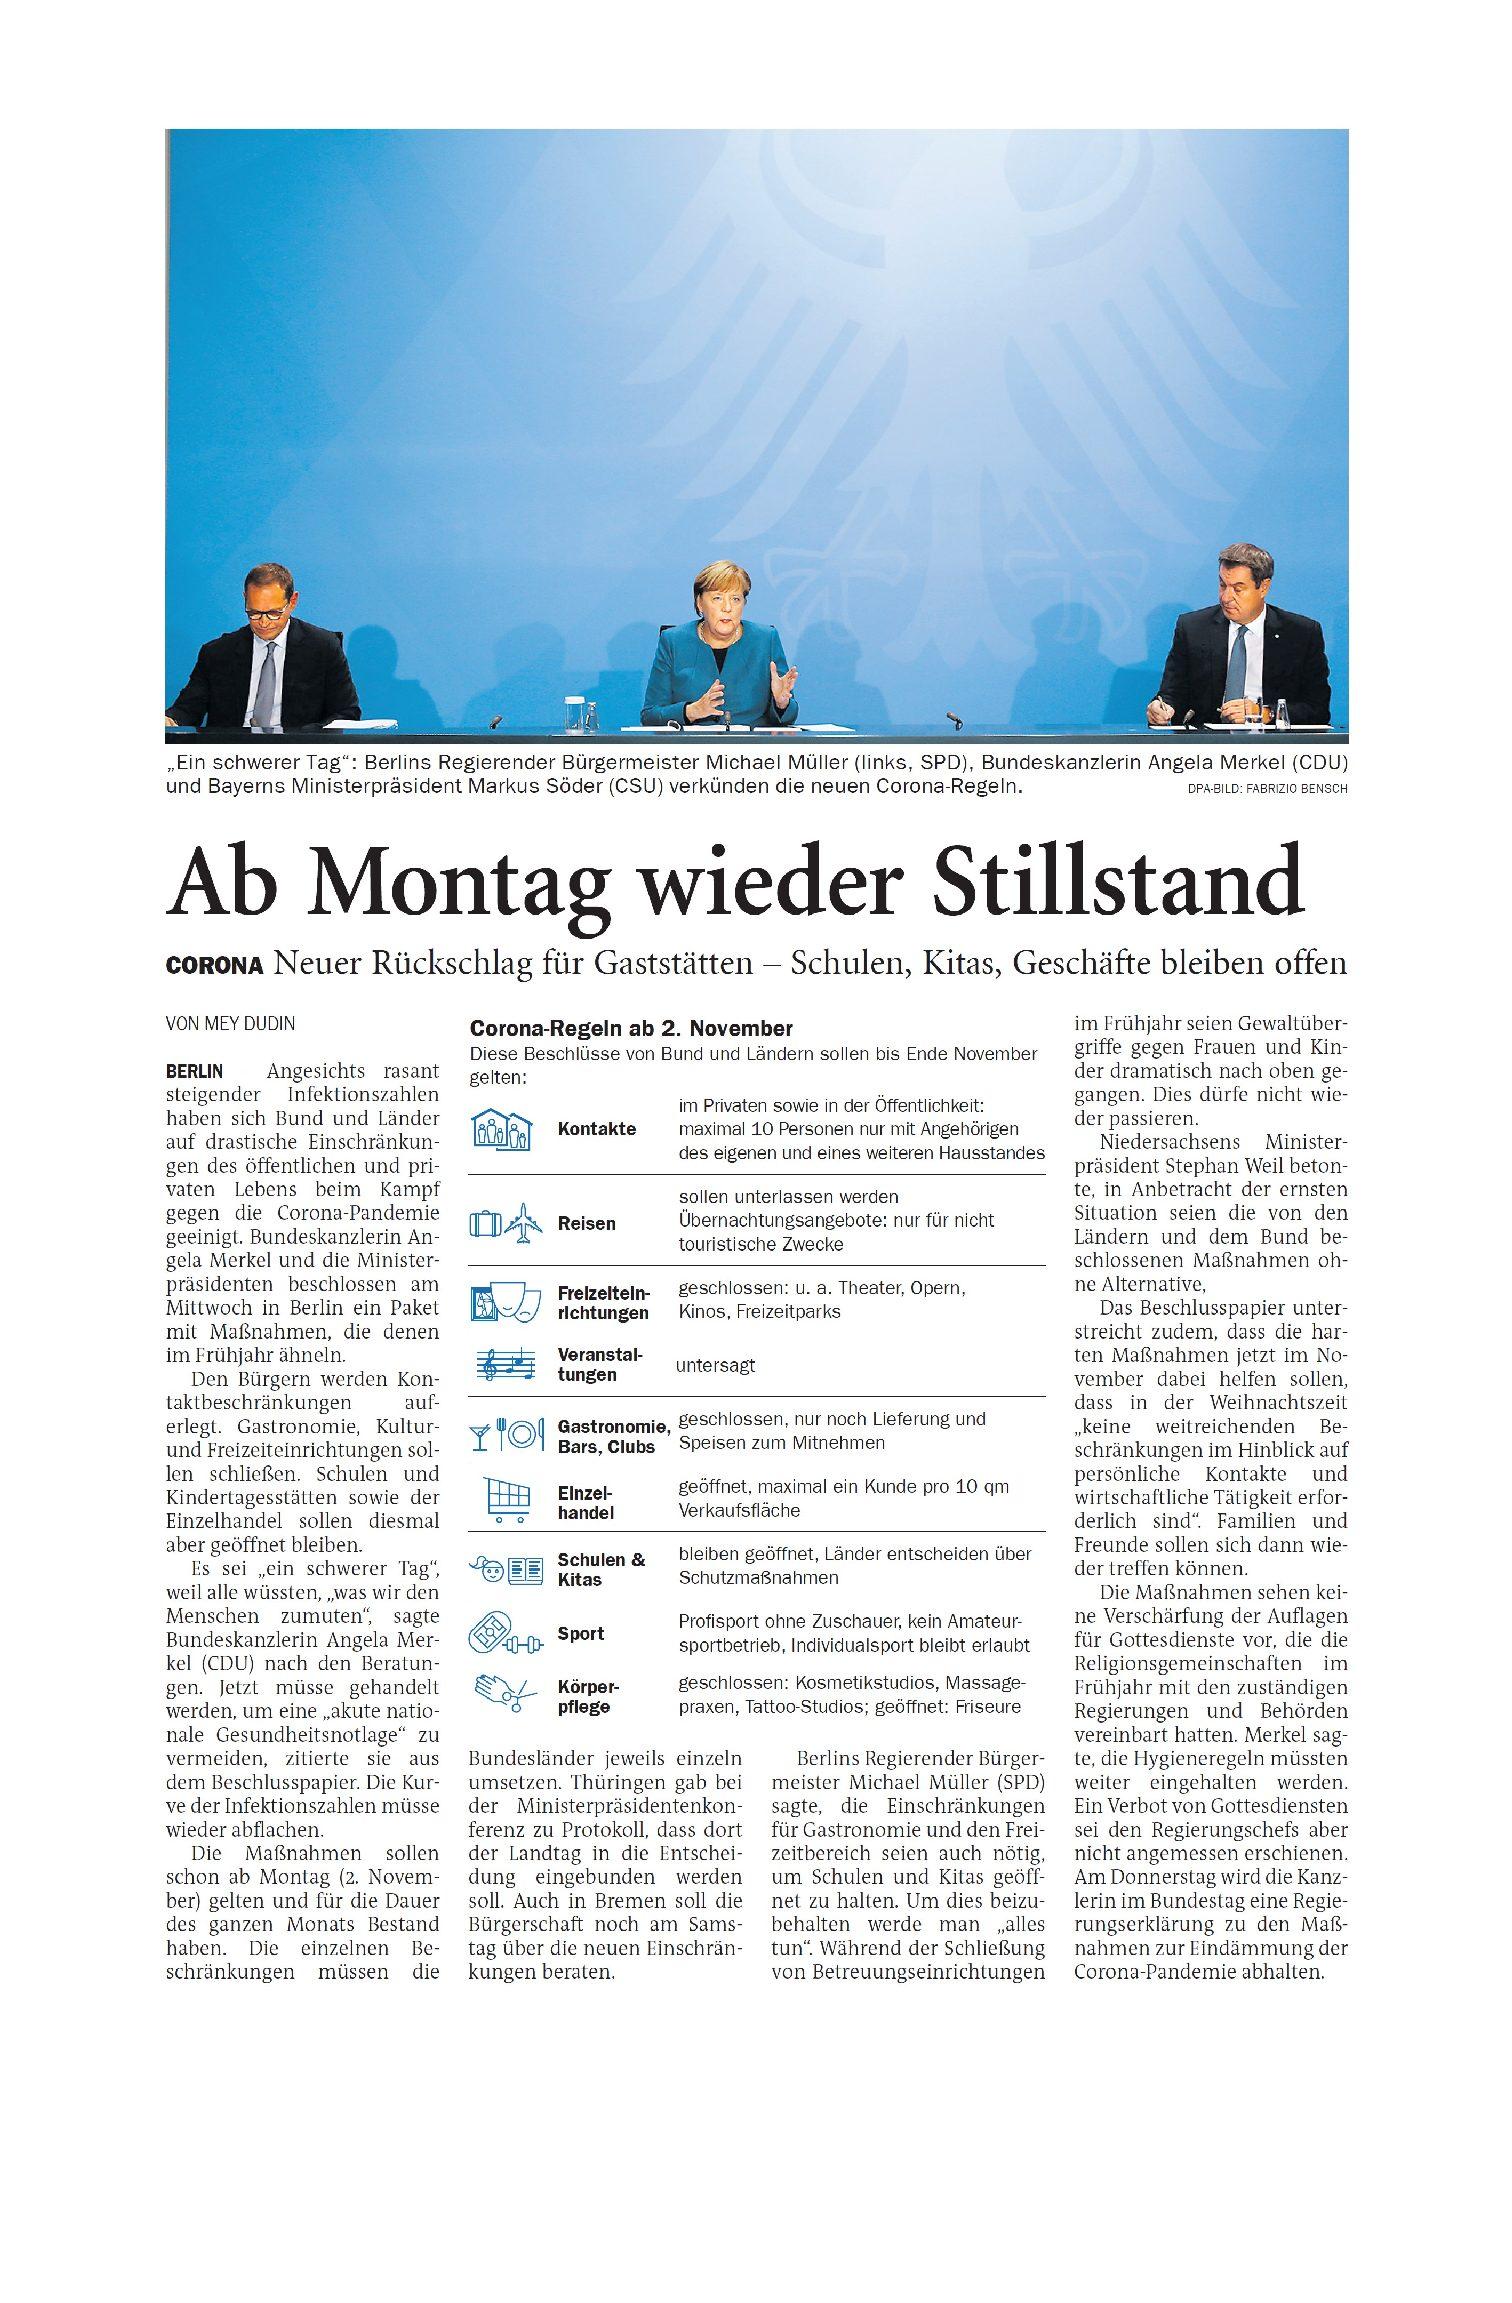 Jeversches Wochenblatt 29.10.2020 III